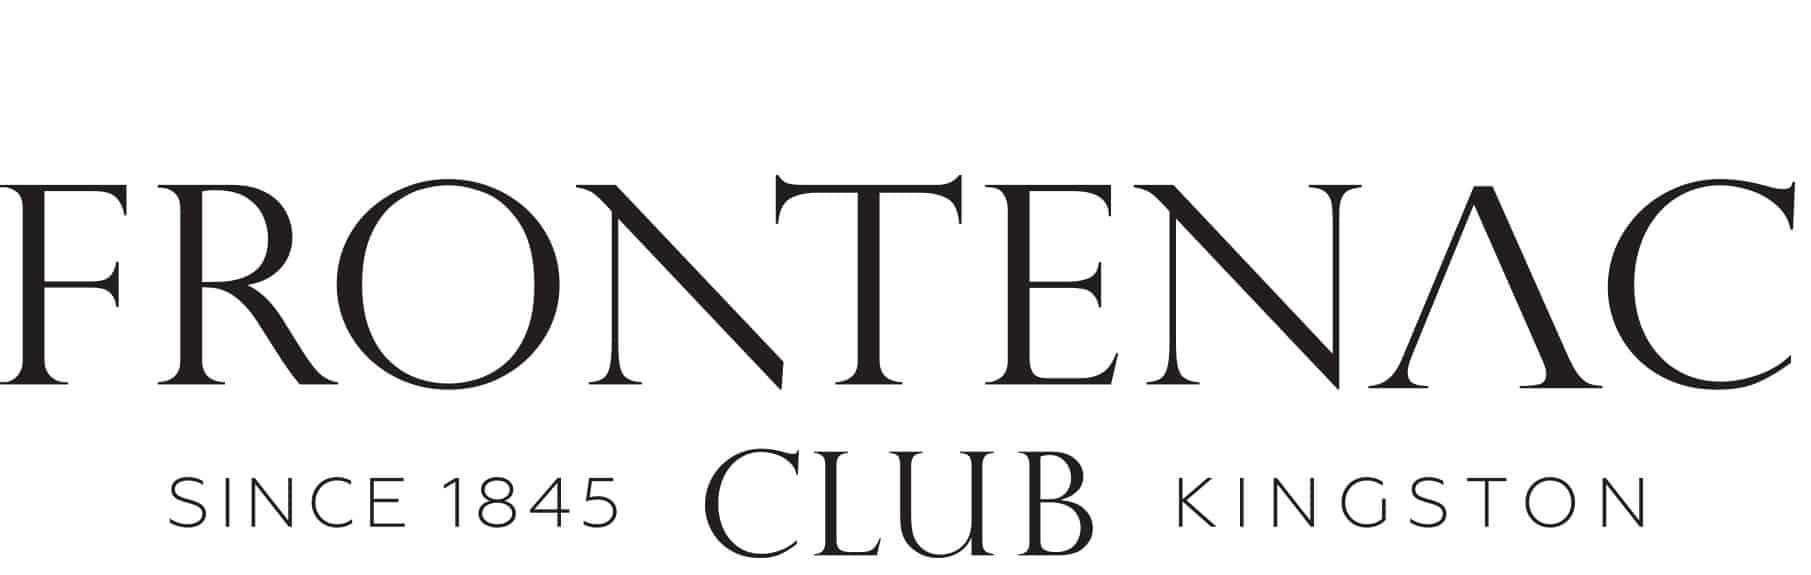 frontenac-club-logo-black-2